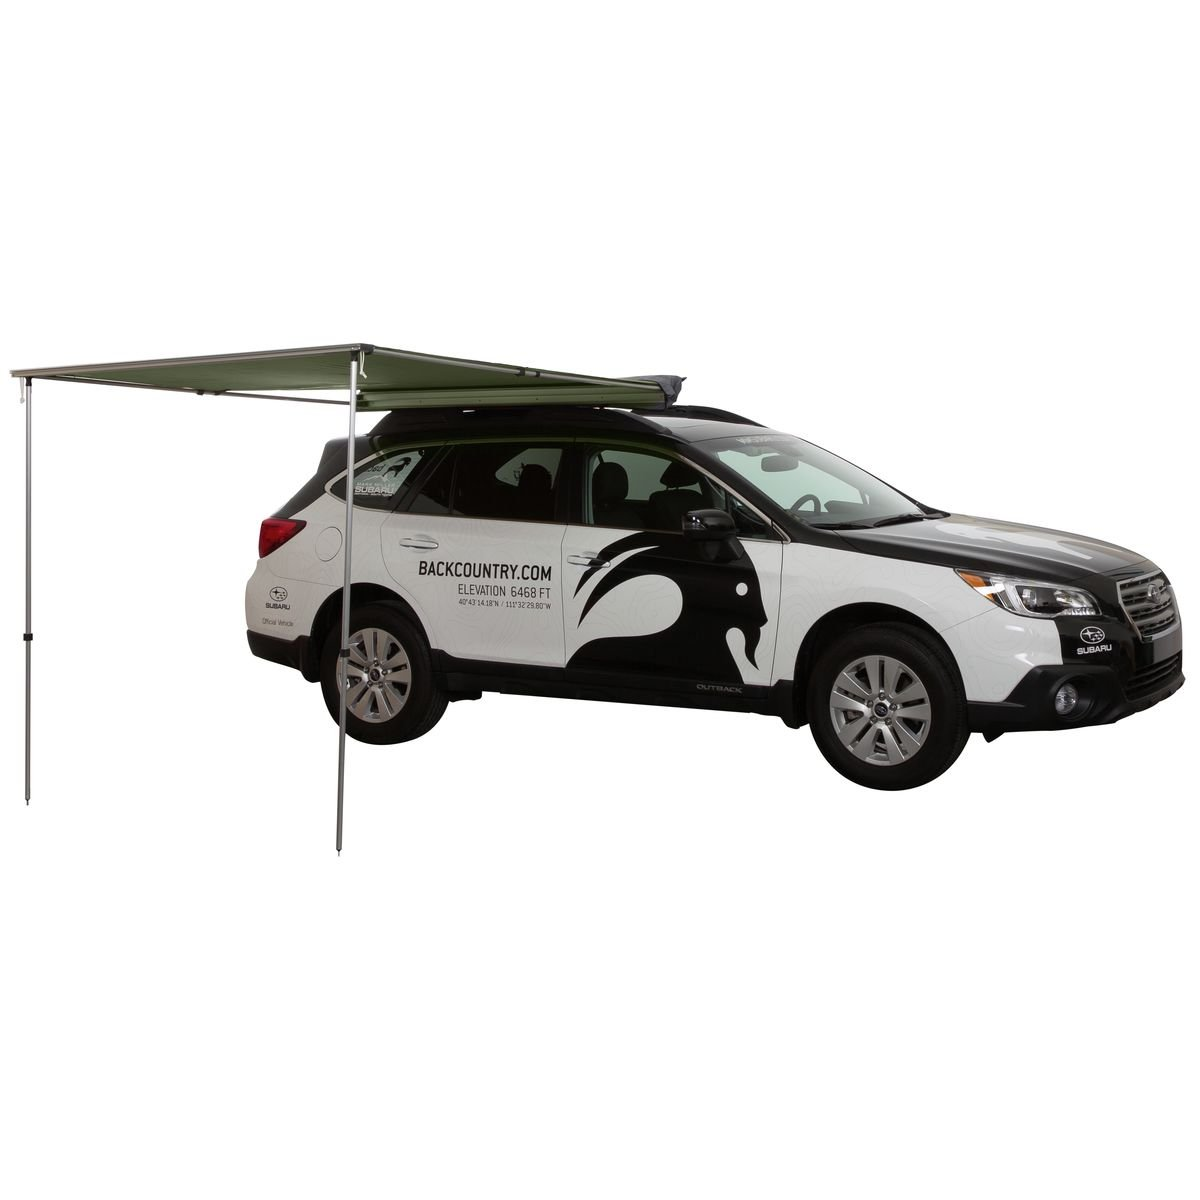 Tepuiオーニング窓 B06XXGV8ZY 4ft|Green Canopy/Black Cover Green Canopy/Black Cover 4ft